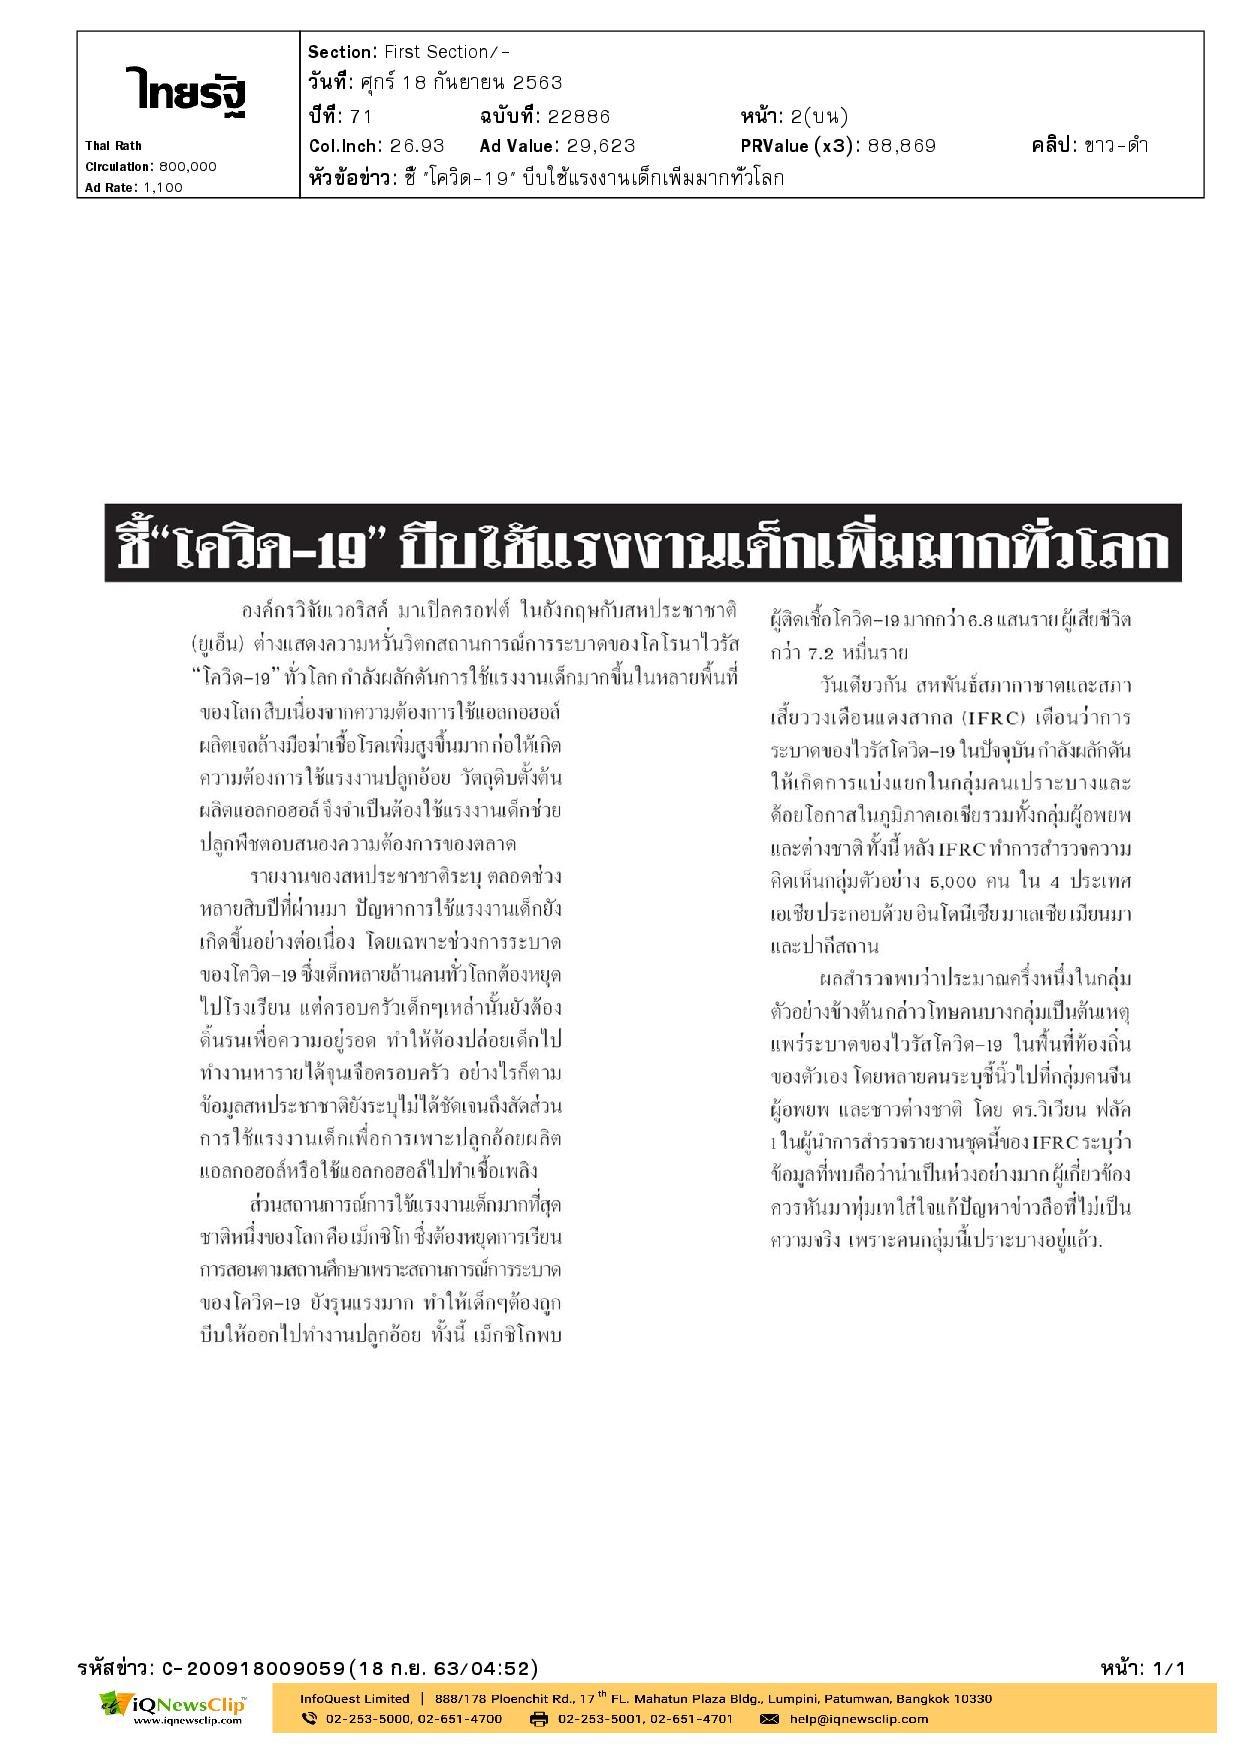 IFRC กล่าวเตือนกรณีการแพร่ระบาดของโรคโควิด-19